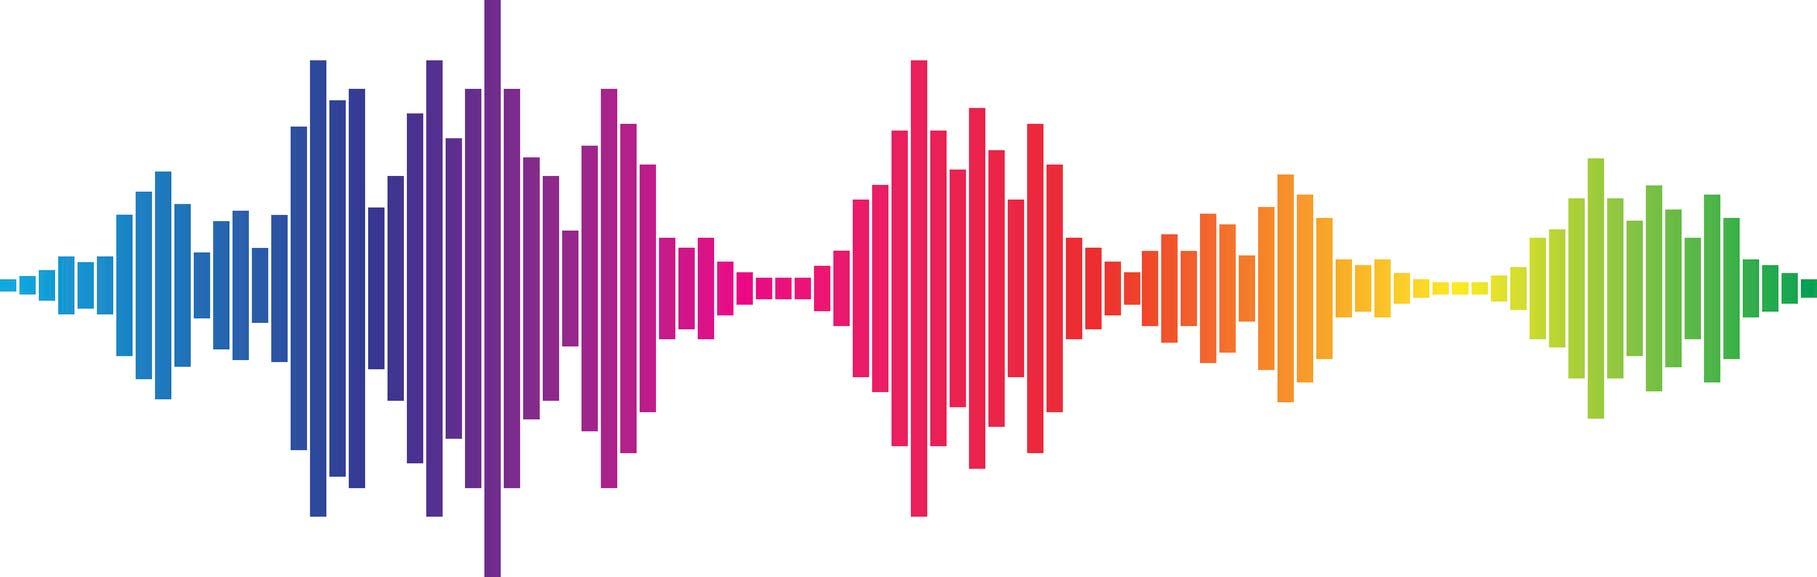 noise wave image